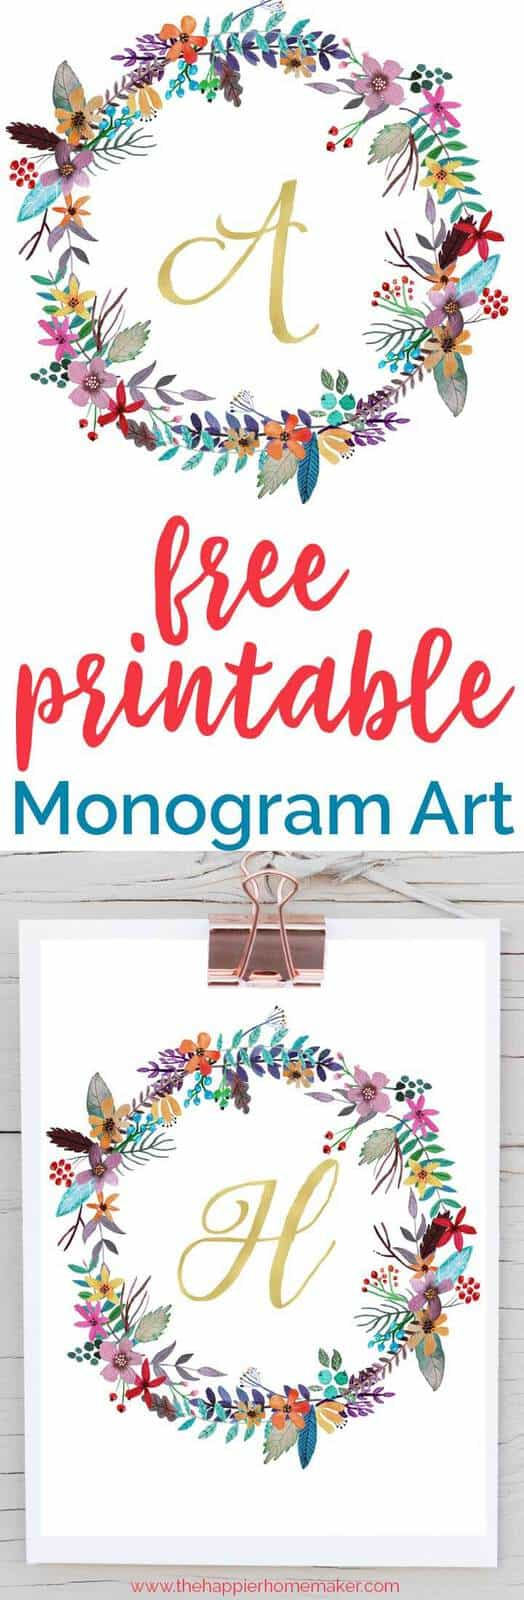 free printable monogram art written over photo of printable